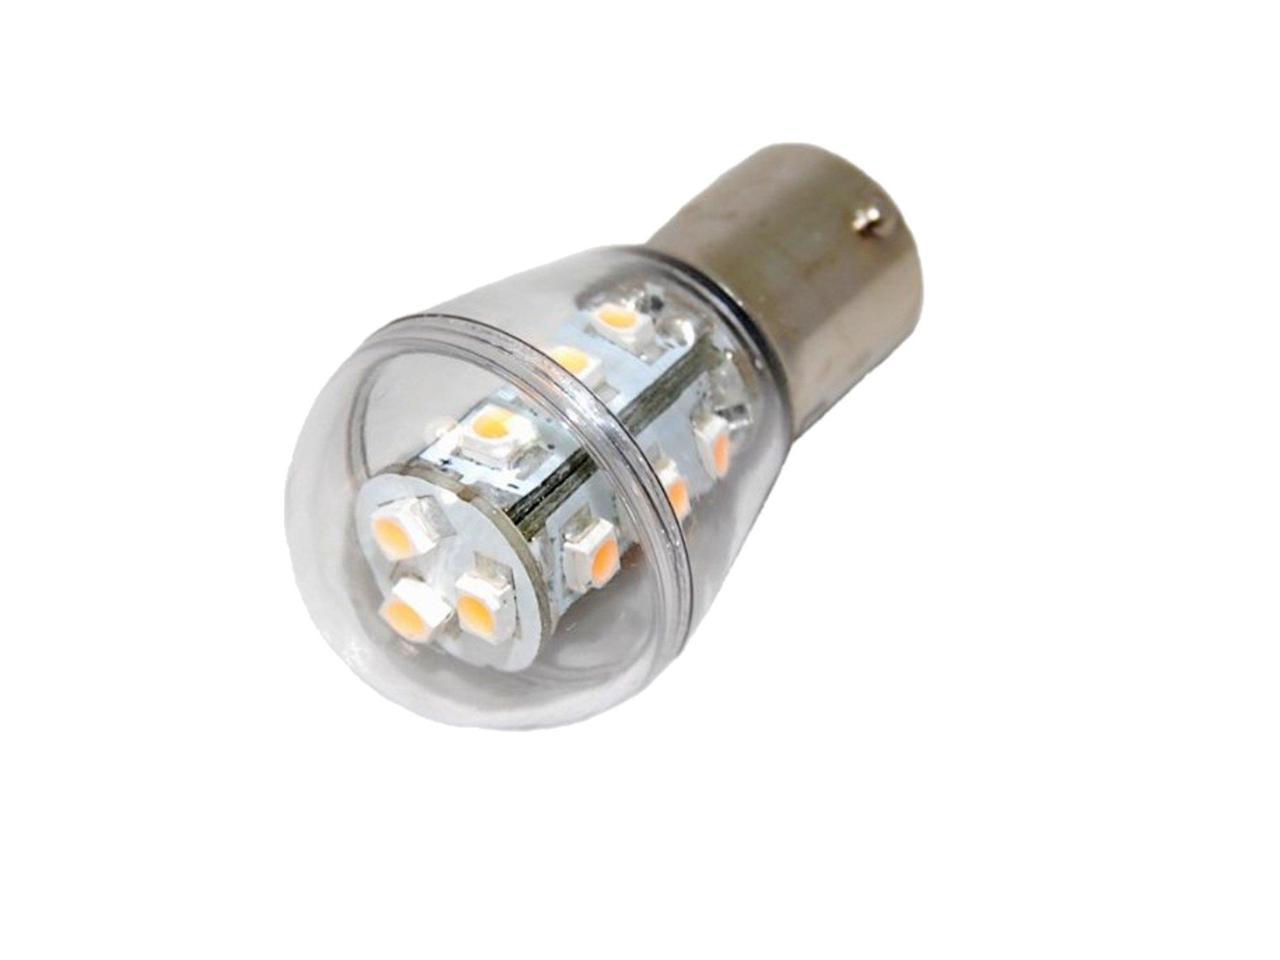 HQRP 2-Pack Headlight LED Bulb compatible with John Deere LTR166 LTR180 LT133 LT150 LT155 LT160 LT166 LT170 LT180 LX255 LX266 LX277 LX279 LX280 LX289 L100 L107 L108 L110 L111 Tractor